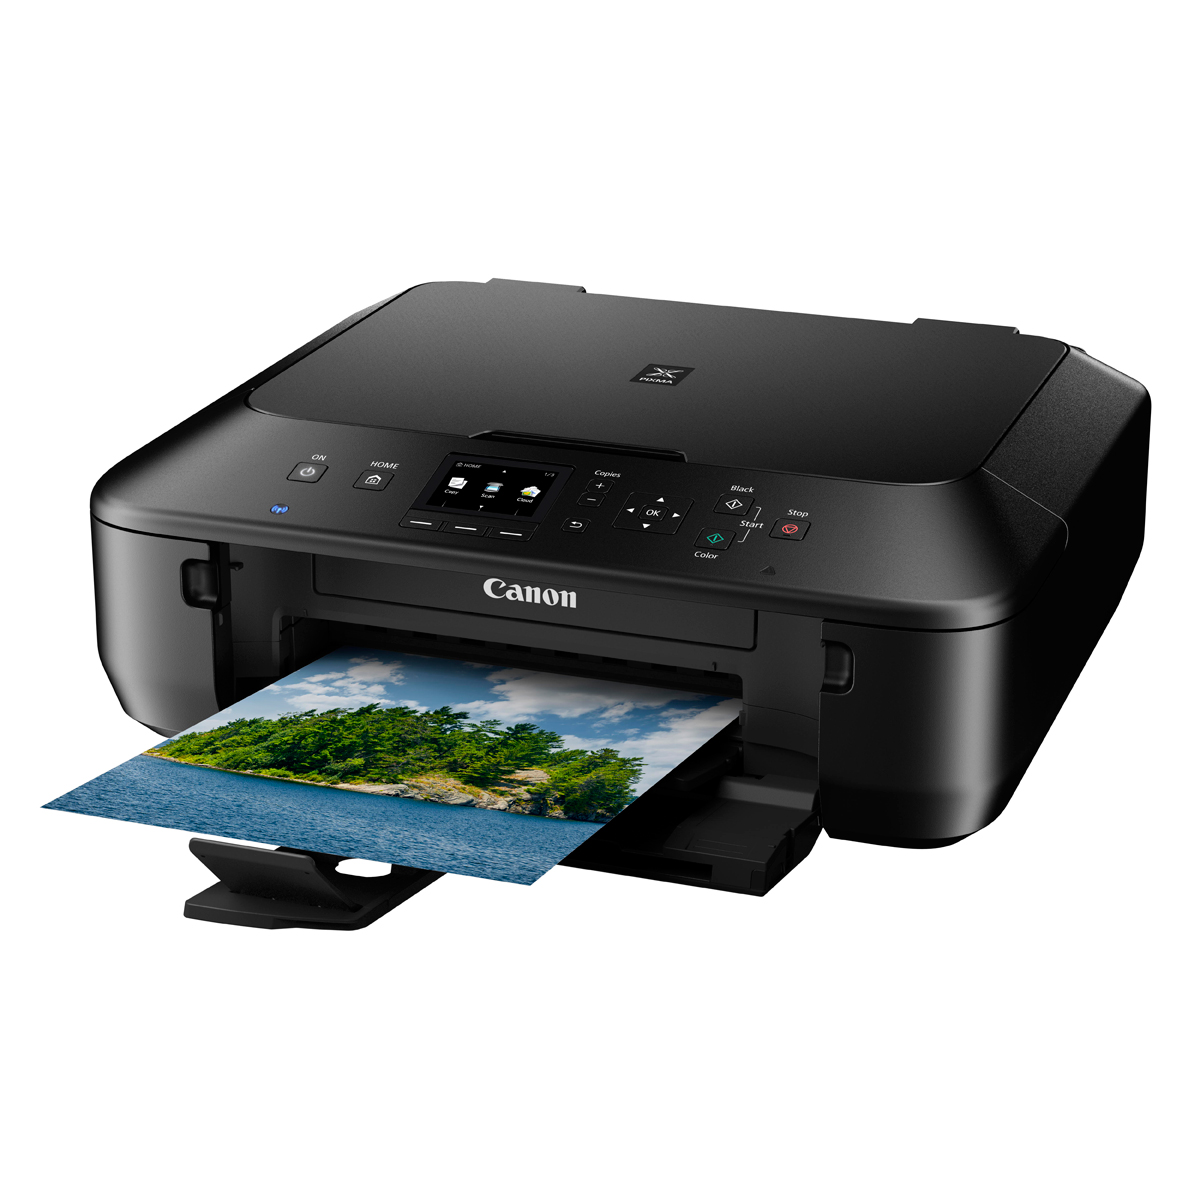 canon pixma mg5550 imprimante multifonctions jet d 39 encre. Black Bedroom Furniture Sets. Home Design Ideas